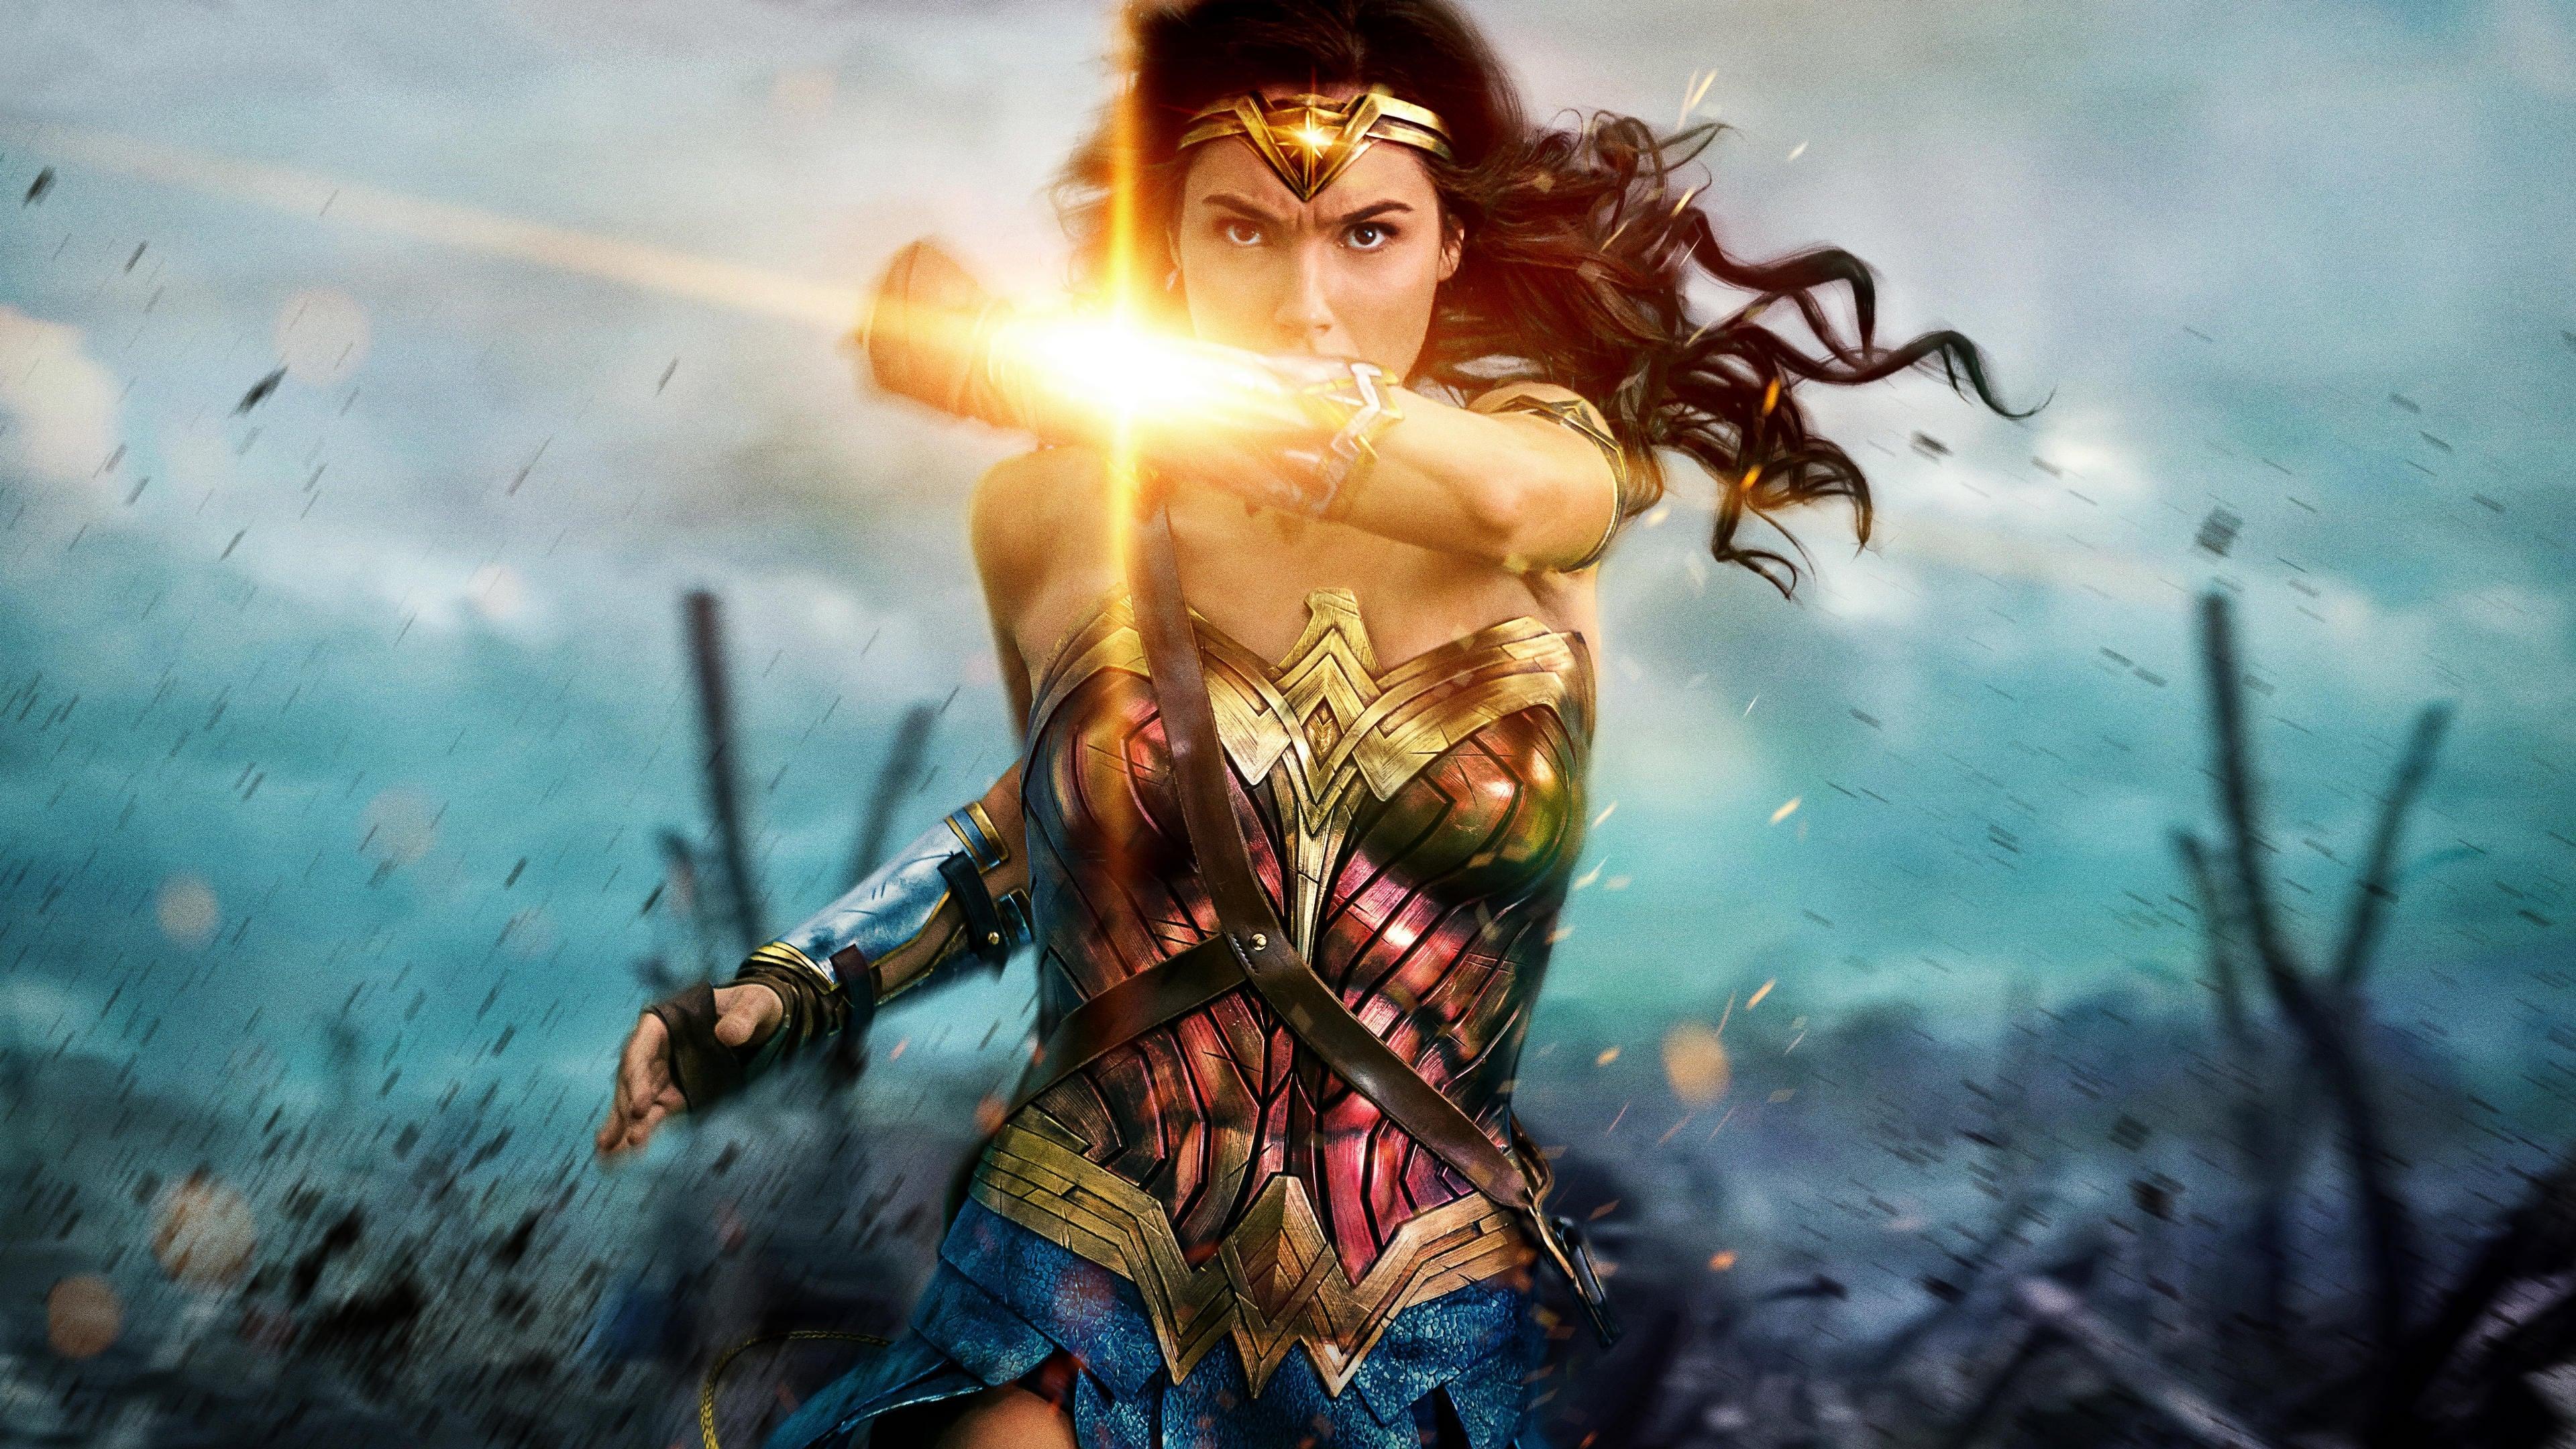 Wonder Woman/神奇女侠|蓝光+长评